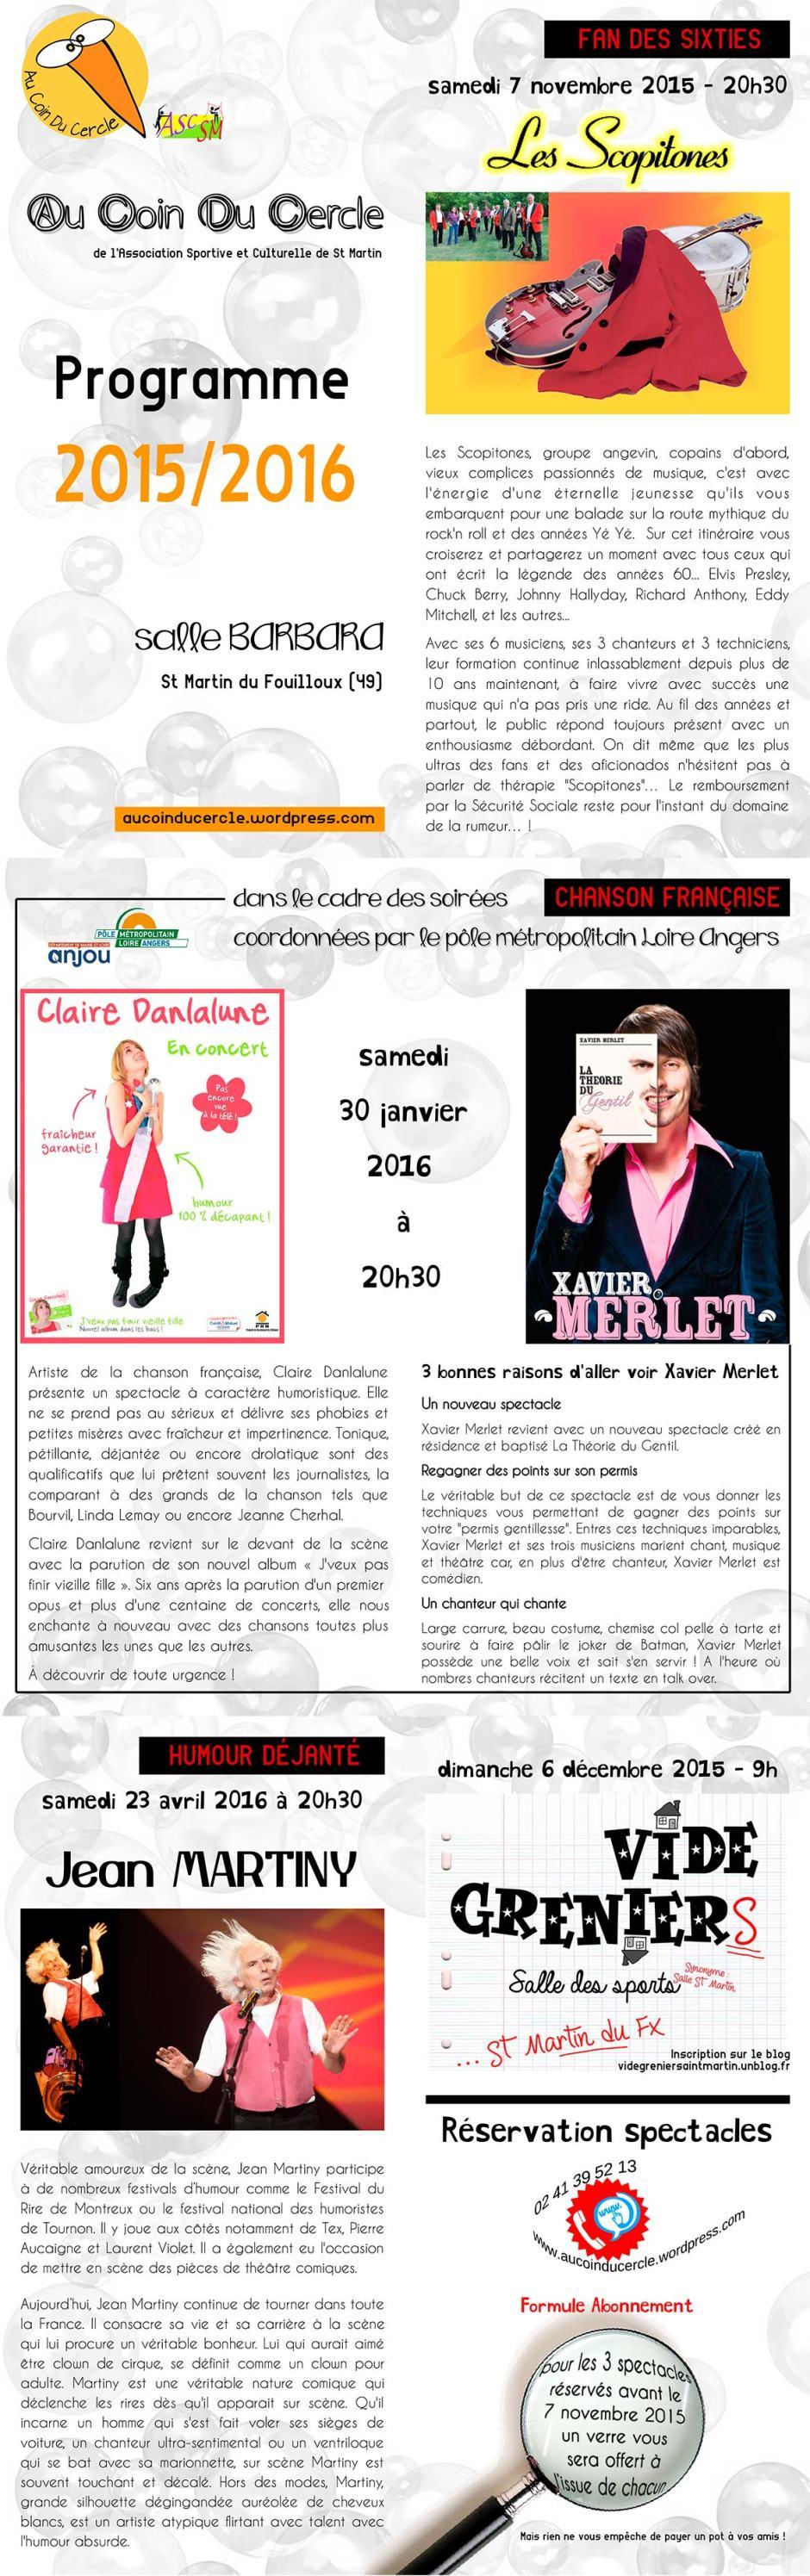 Programme 2015-2016 HautW